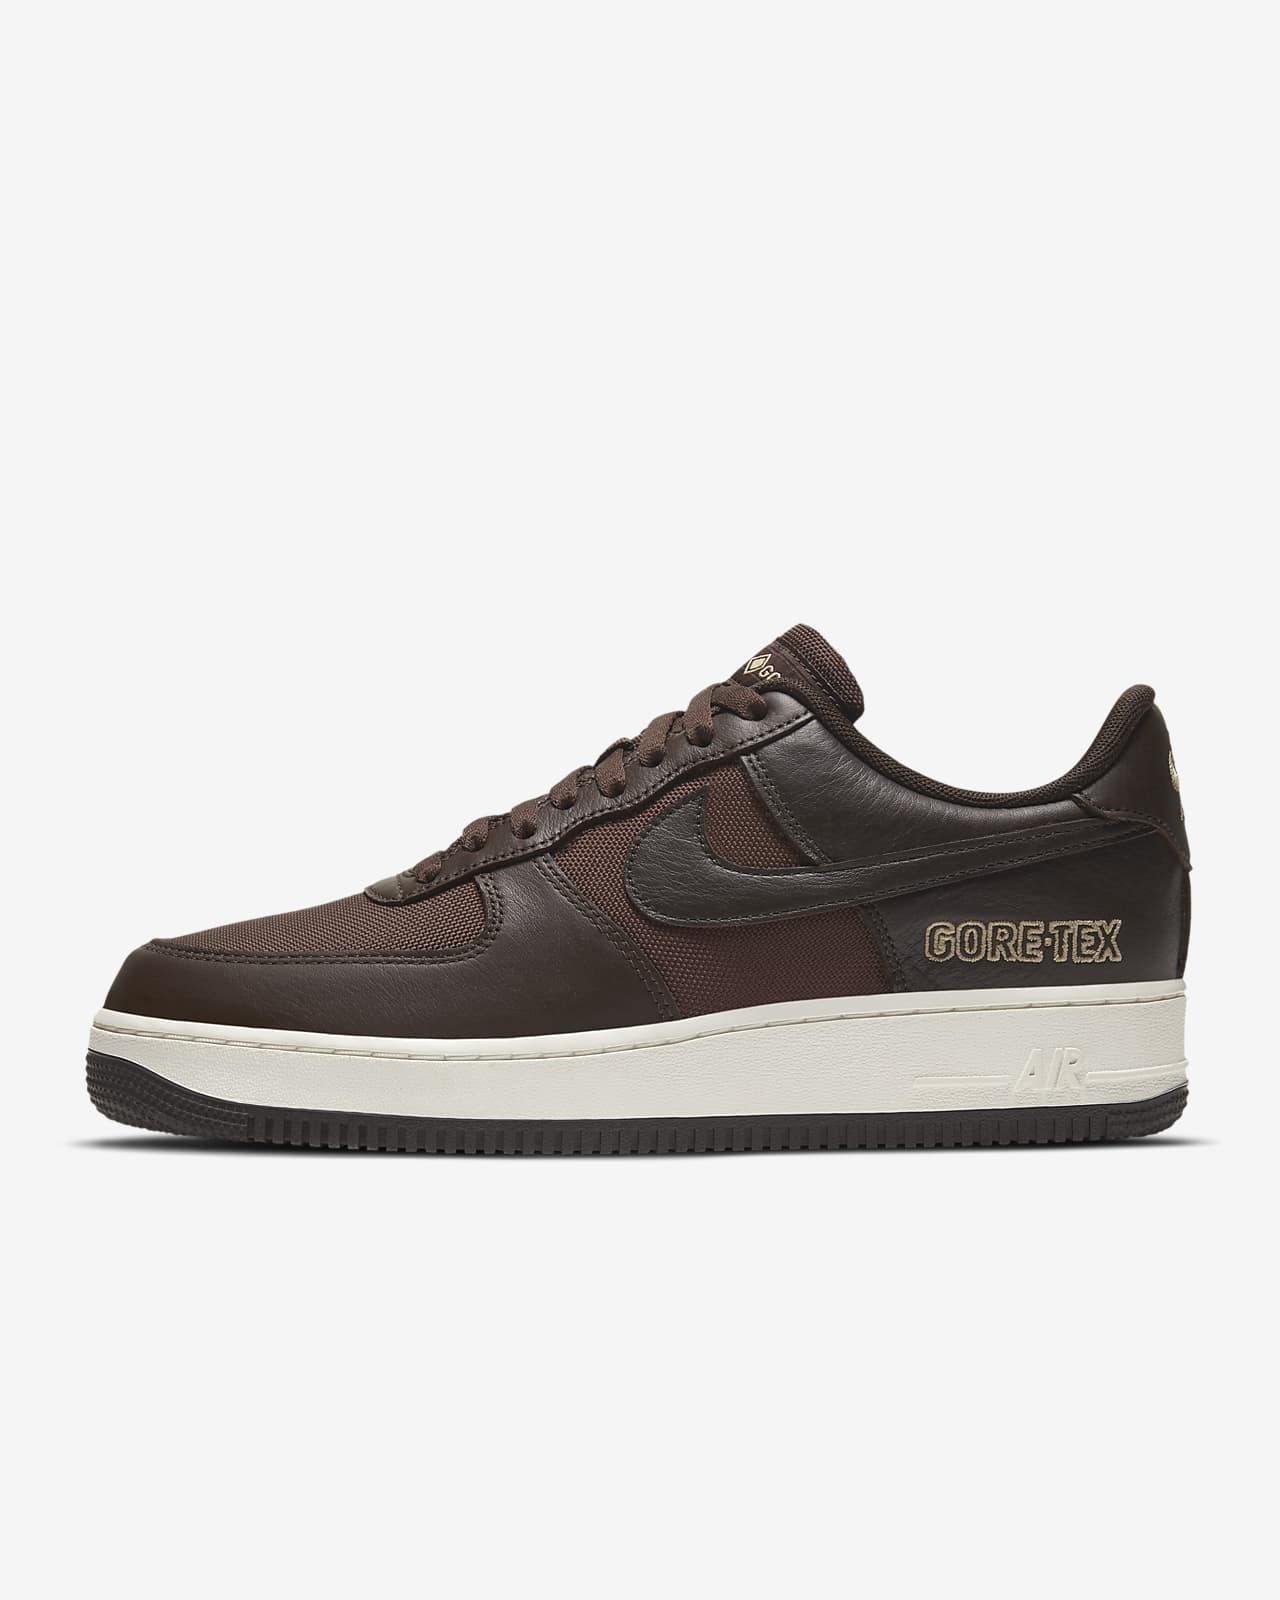 Chaussure Nike Air Force 1 GTX pour Homme